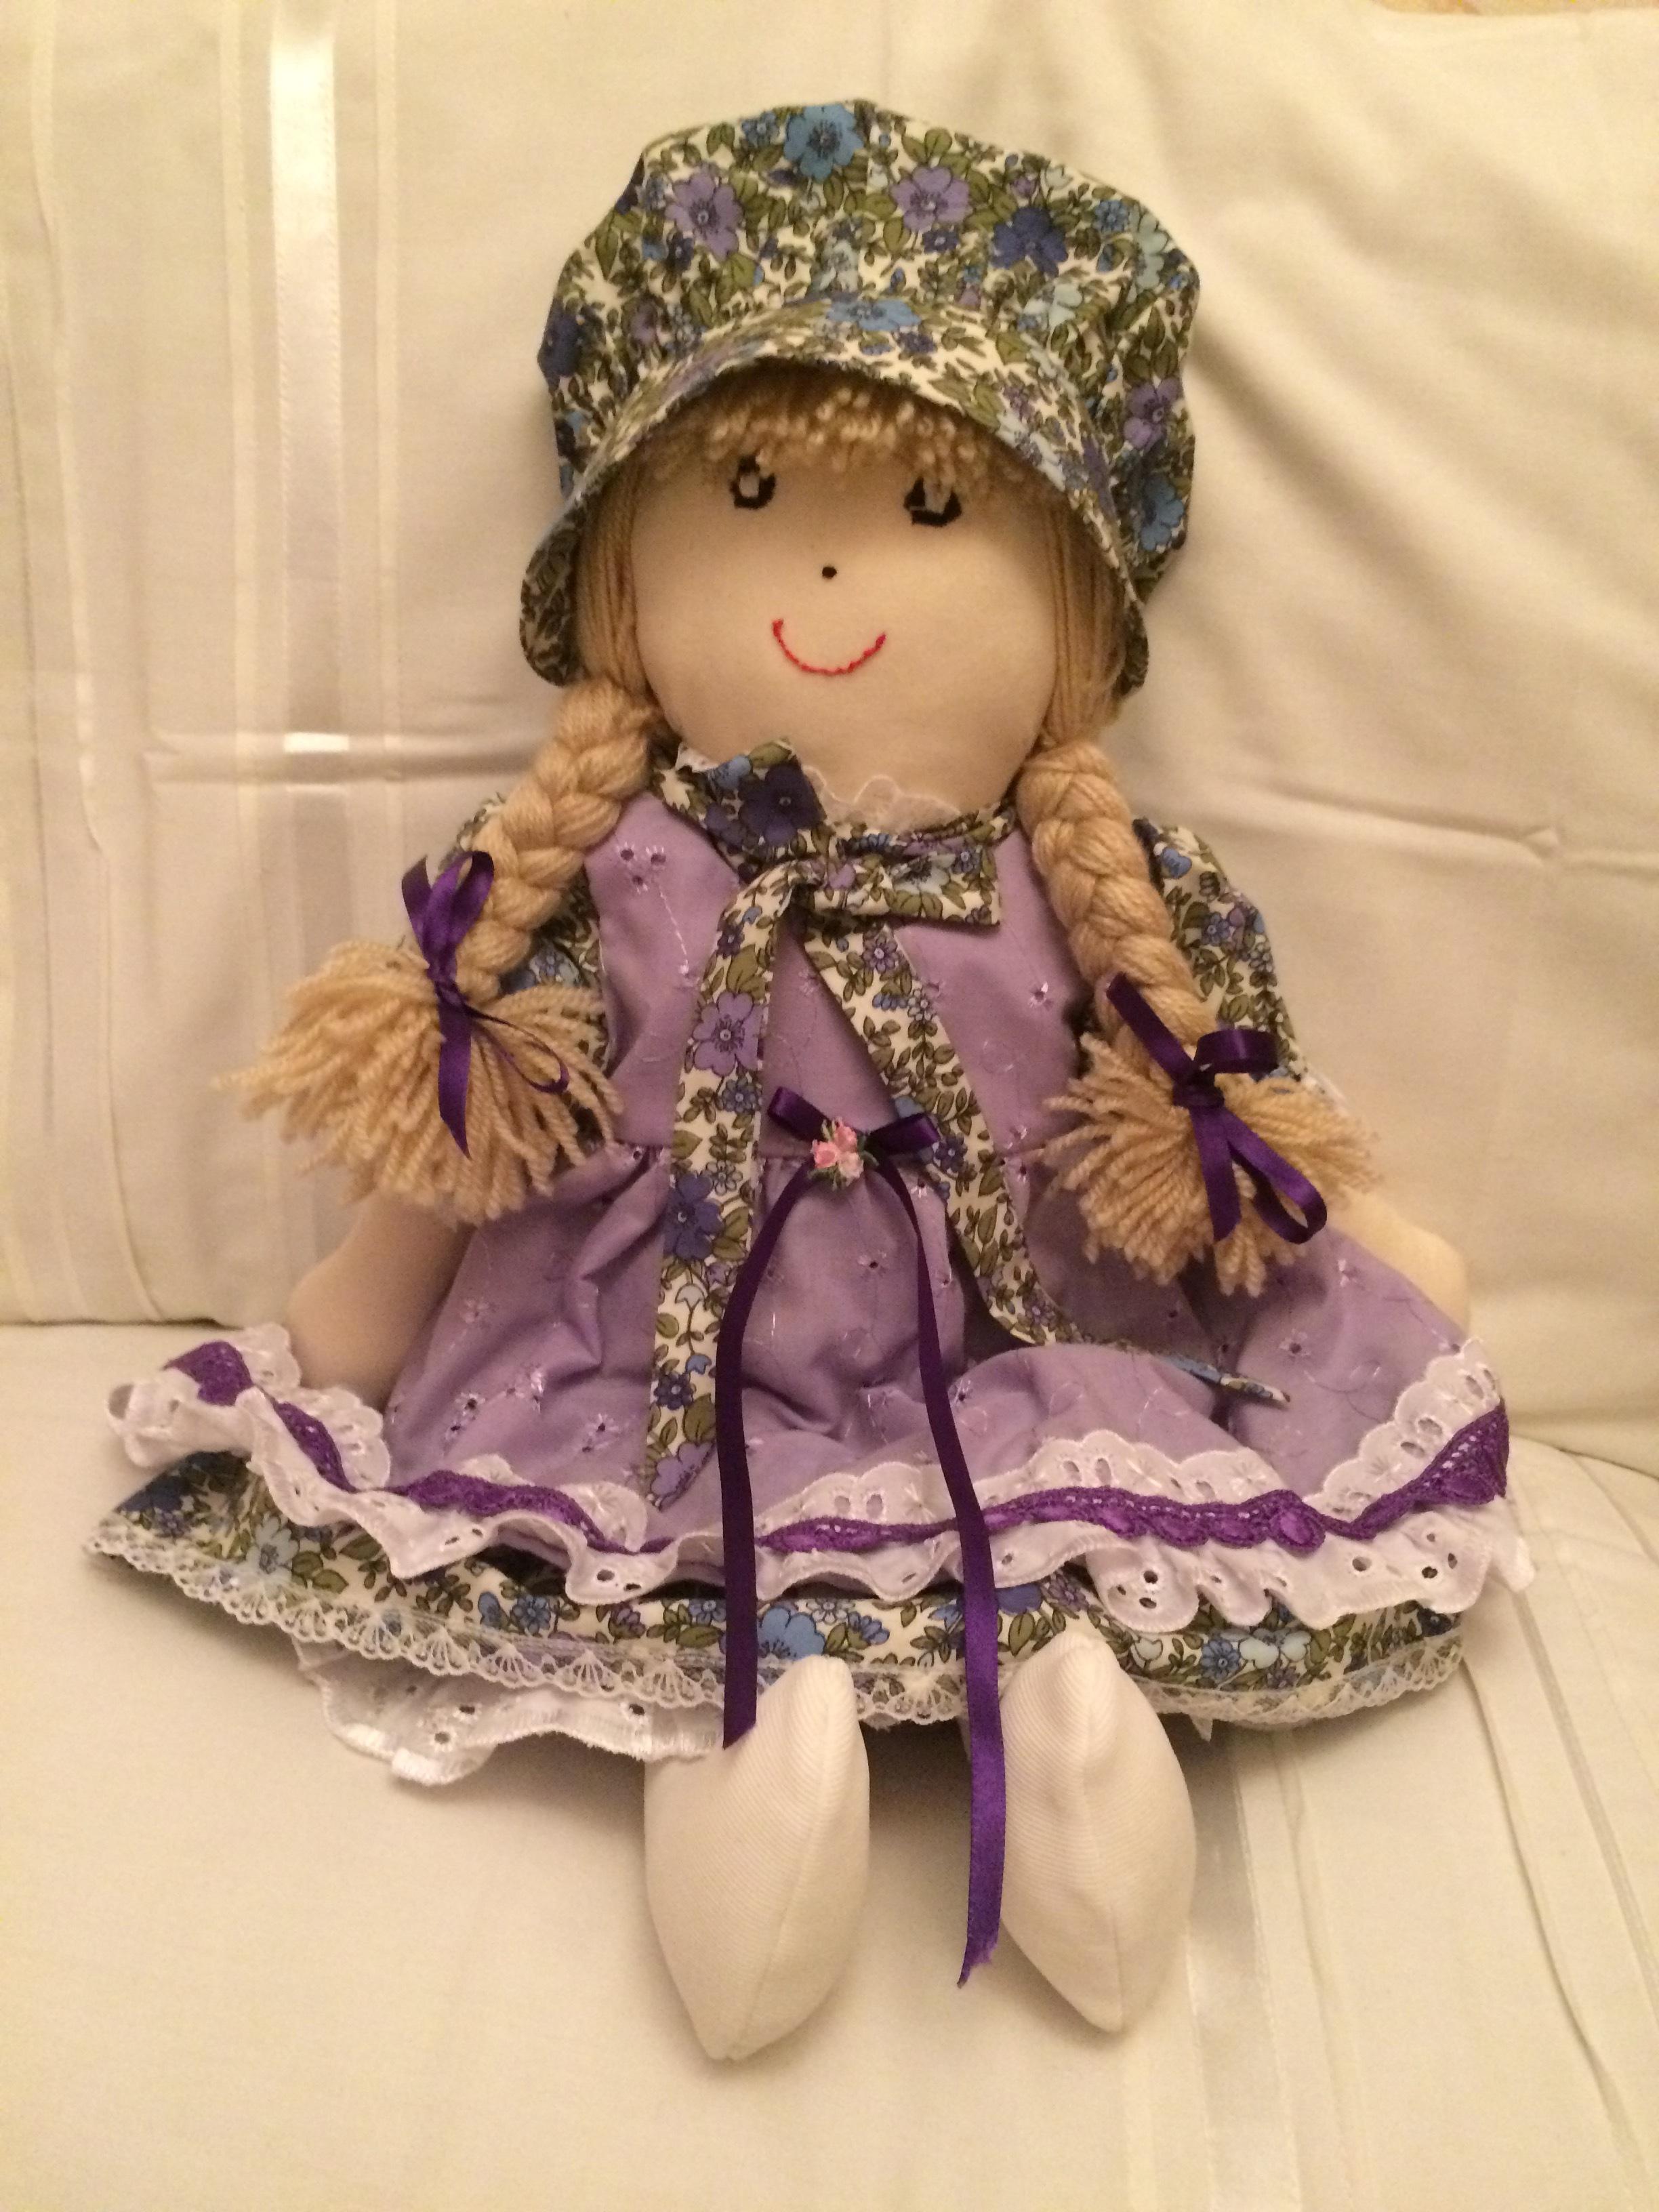 Granny Smith Rag Dolls -